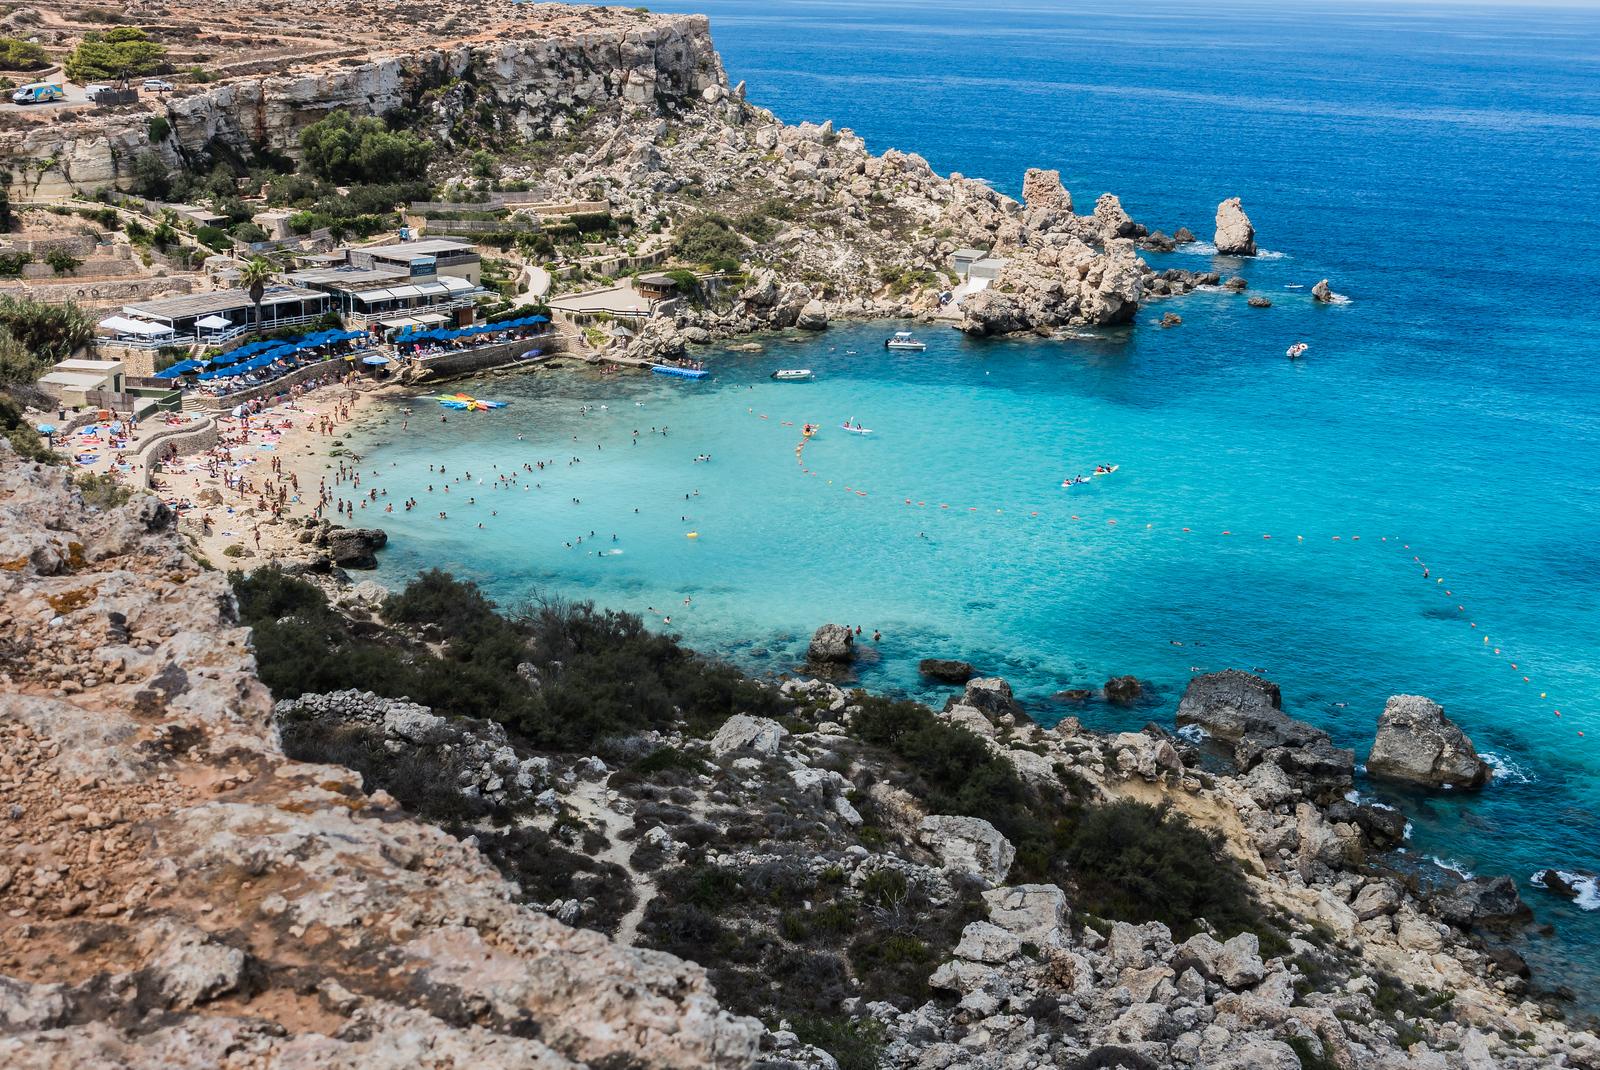 Malta Pictures - Paradise Bay